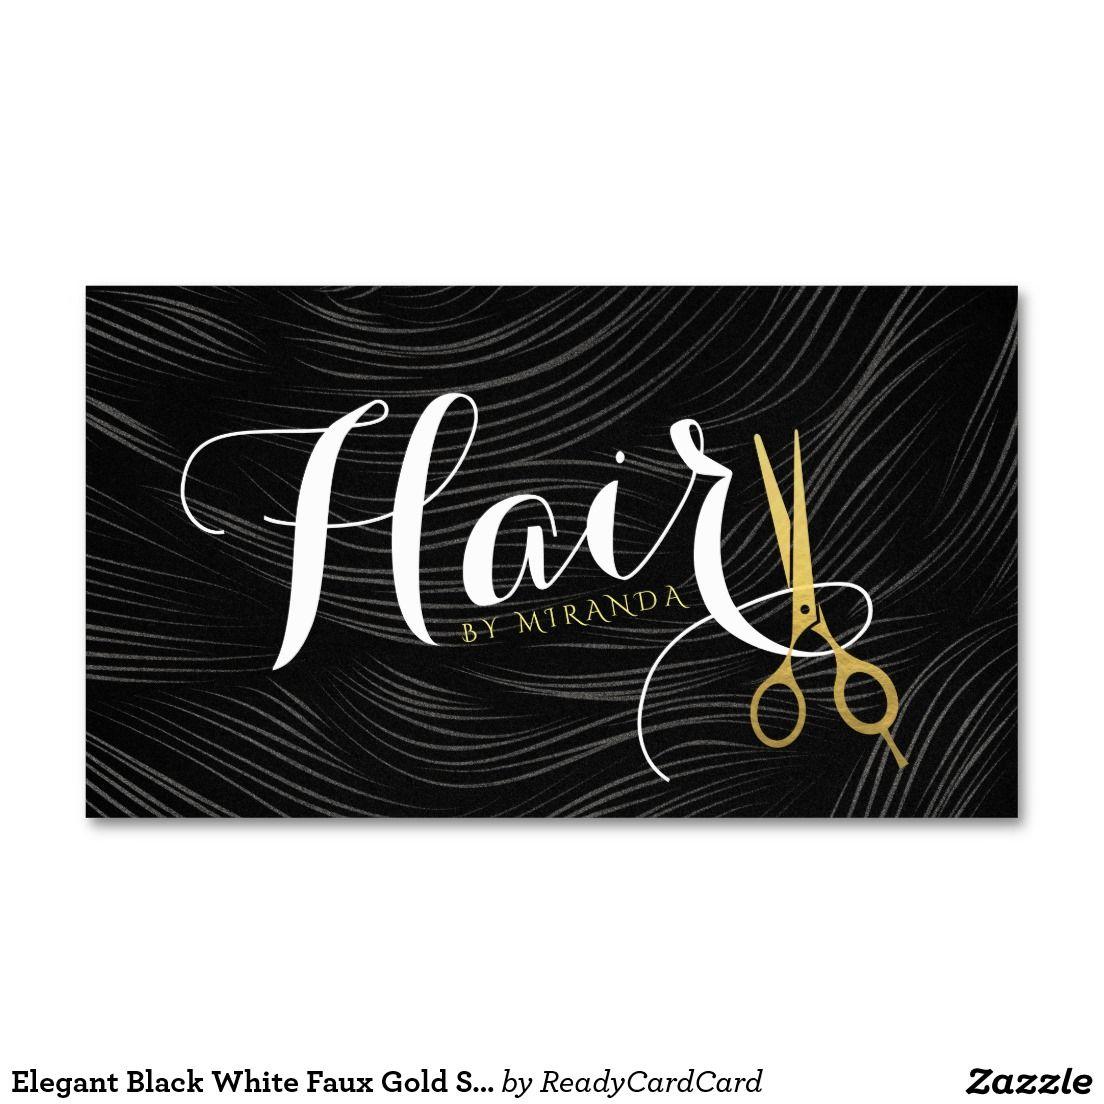 Elegant Black White Faux Gold Scissors Hair Salon Business Card ...